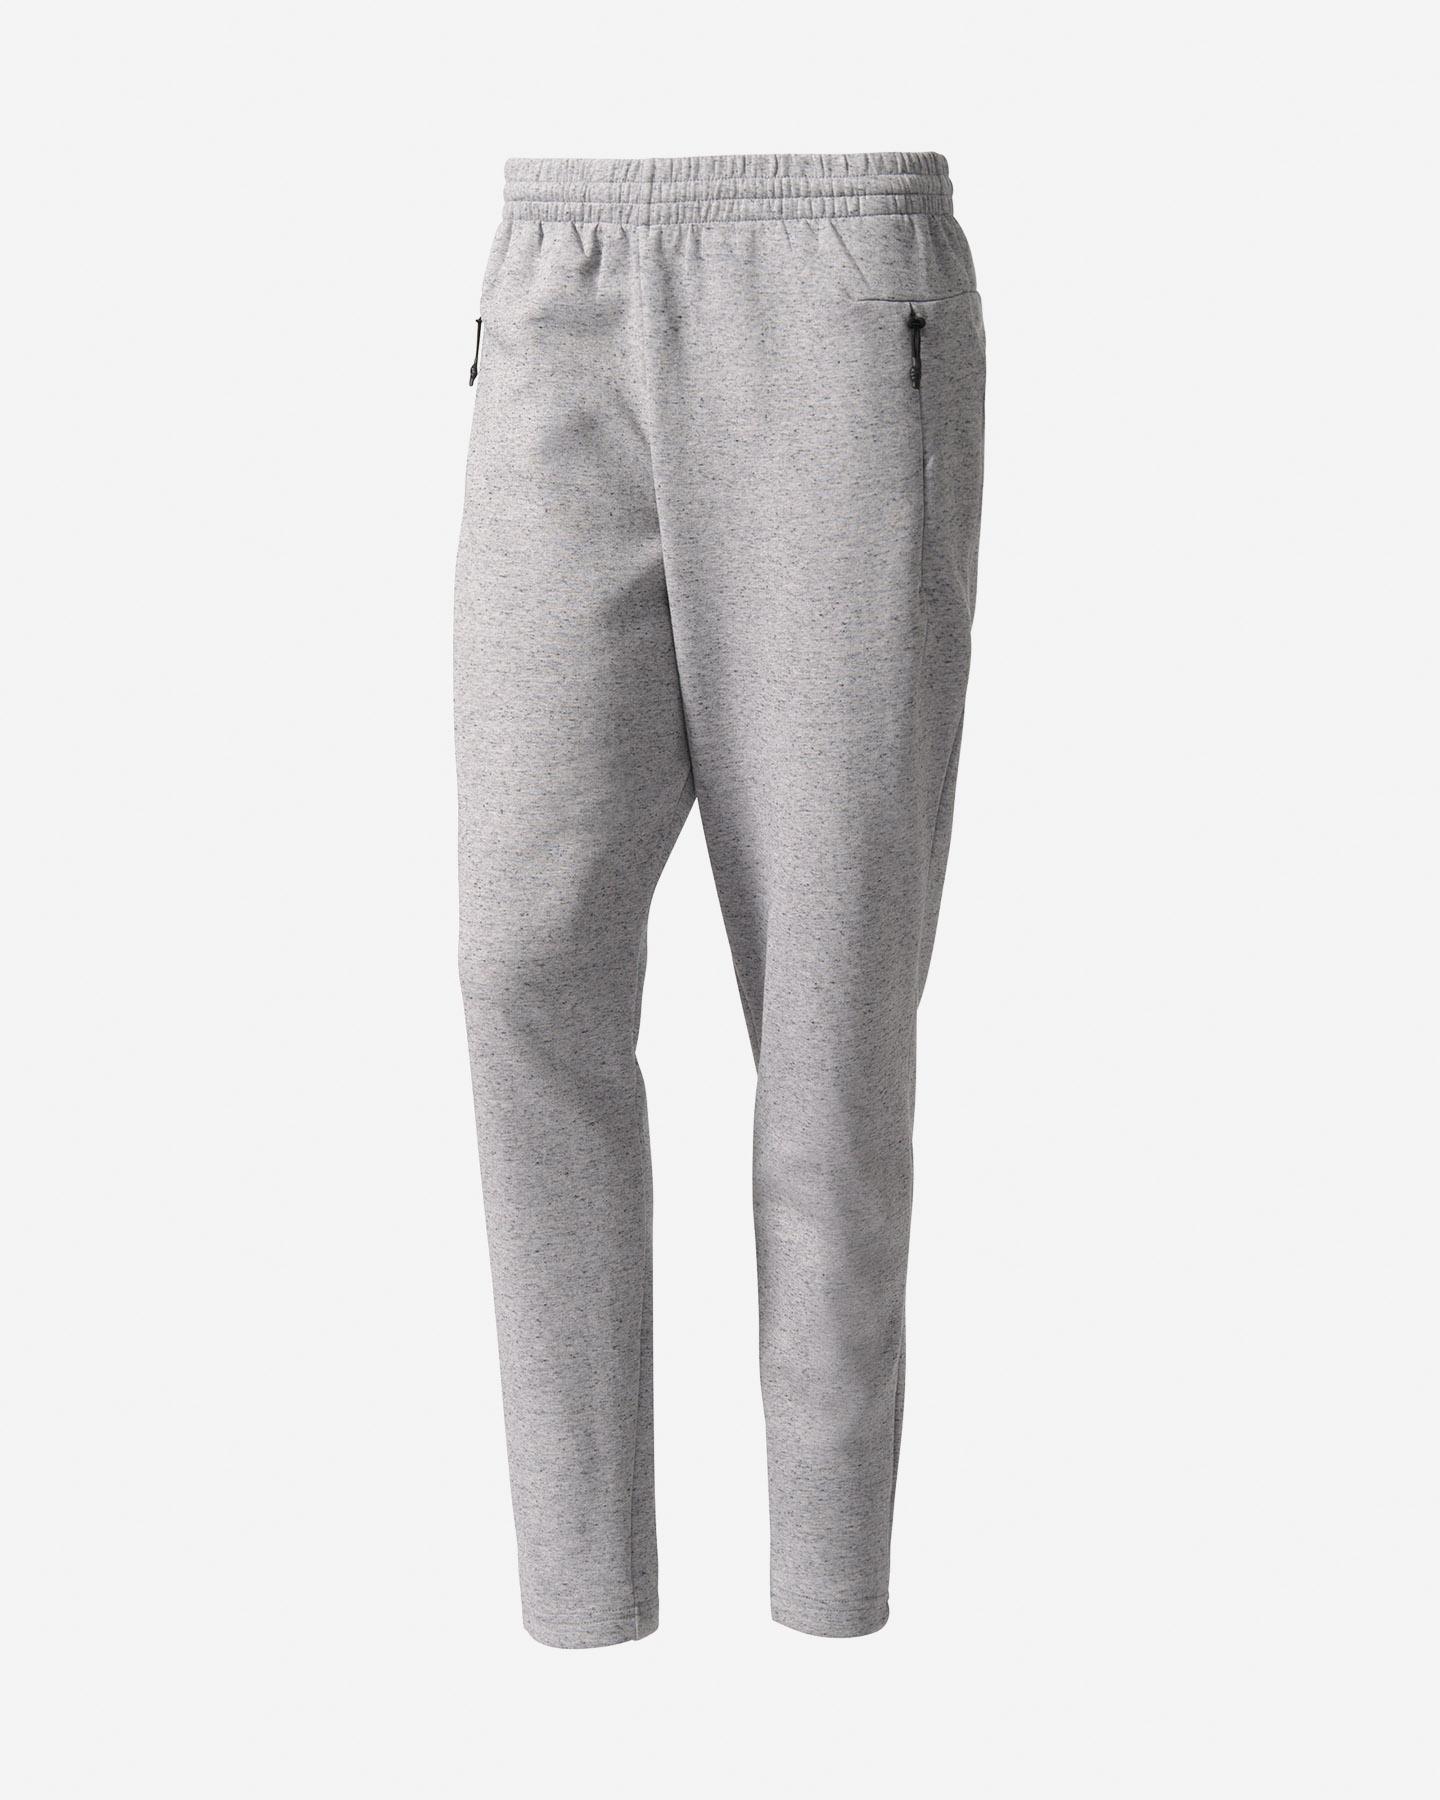 pantaloni adidas palestra